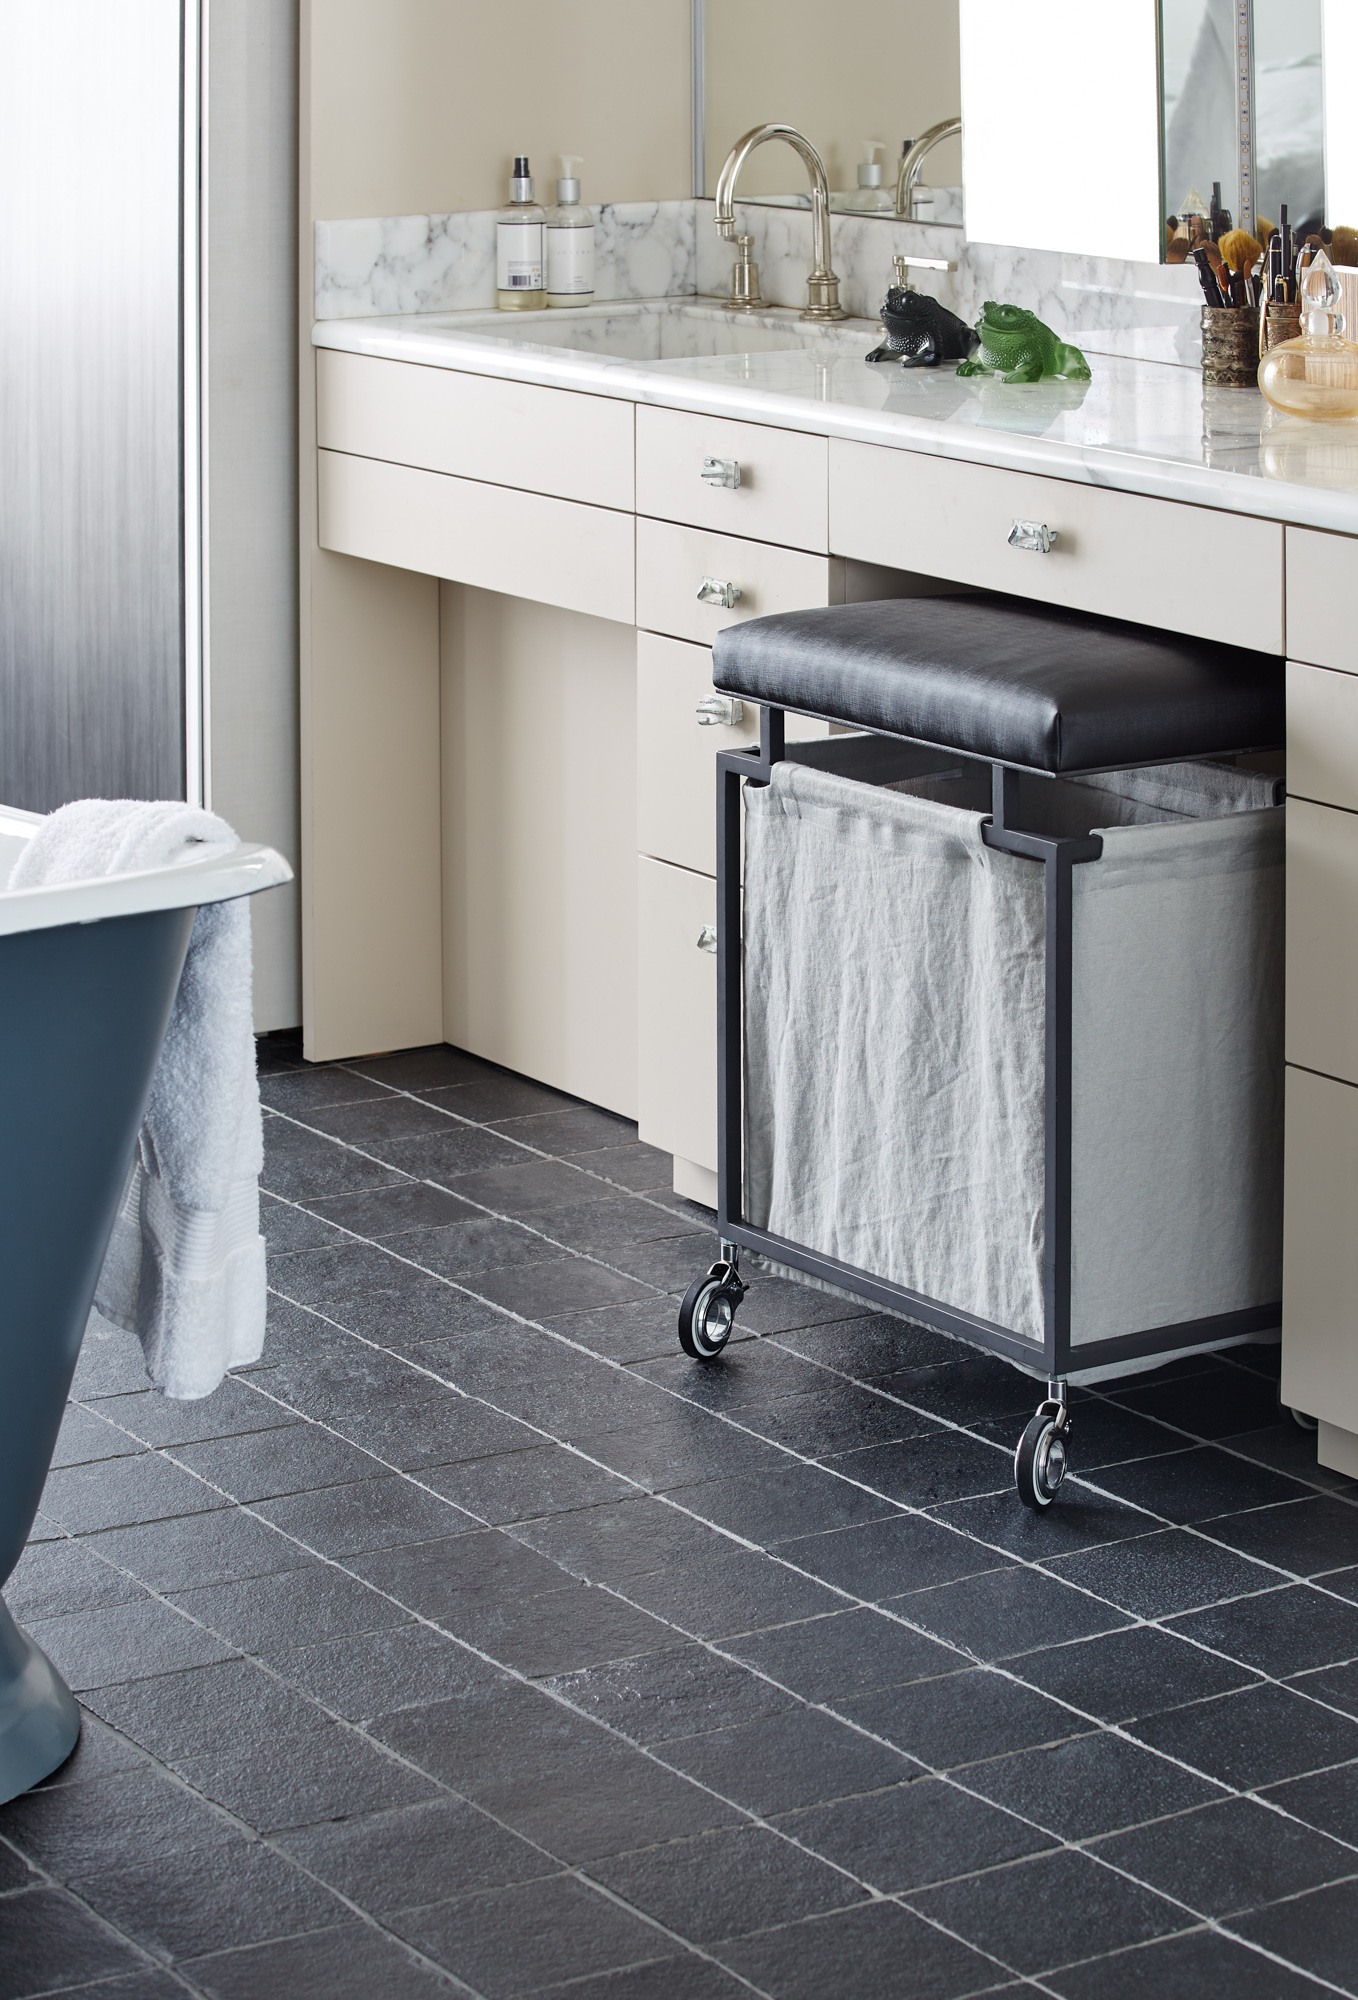 B&D Laundry Basket-1-LowRes.jpg